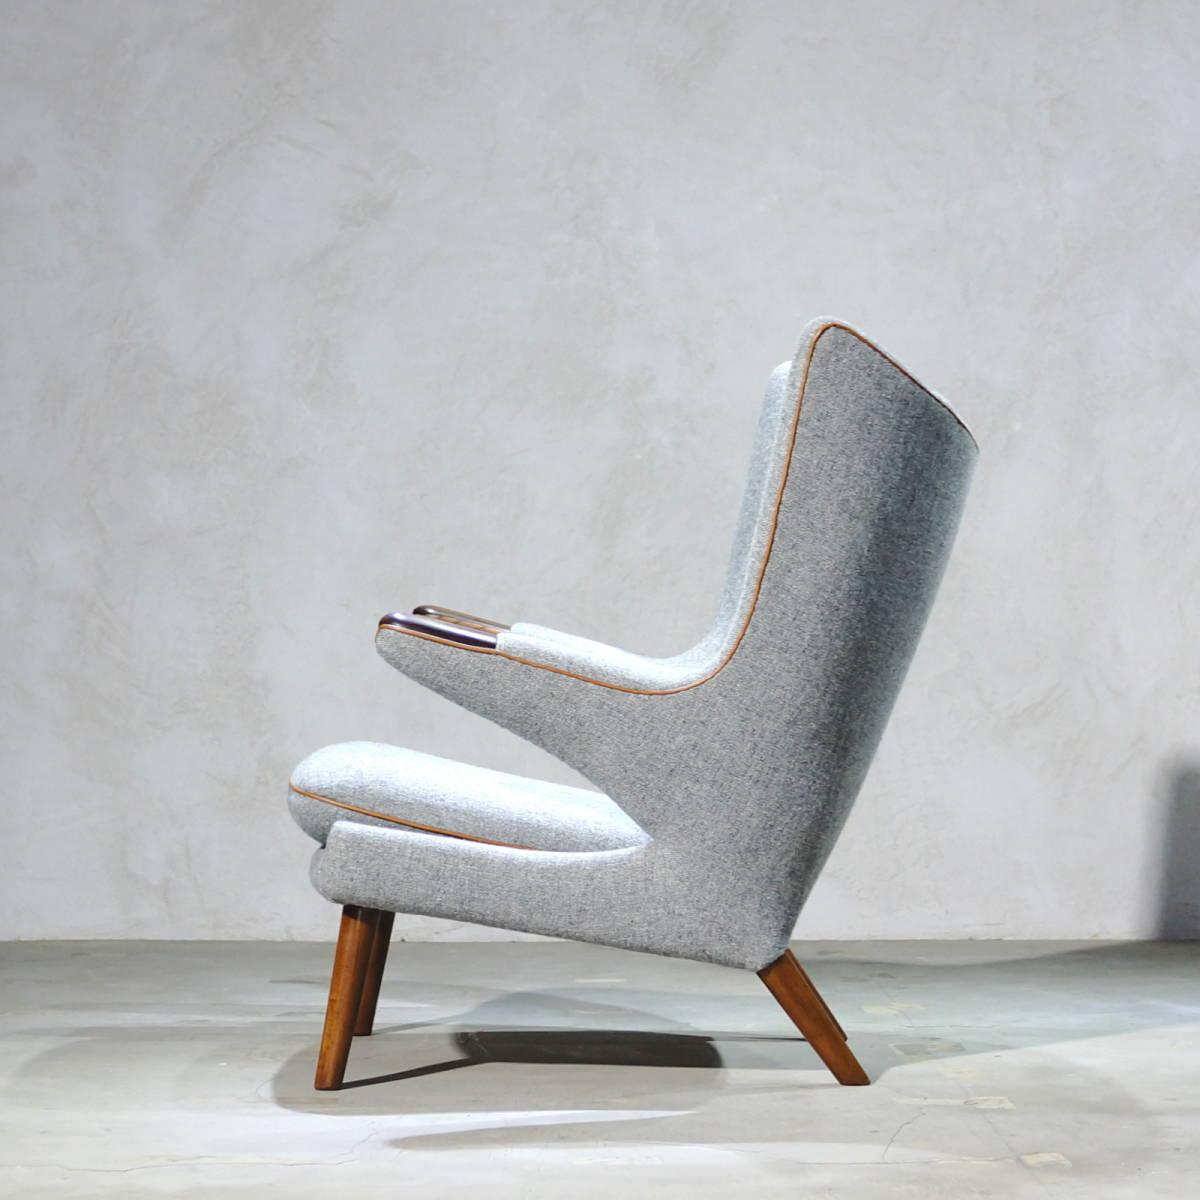 Hans J. Wegner ウェグナー AP-19 Bear Chair ベアチェア Rosewood & Teak ローズウッド&チーク ※フィンユール モーエンセン_画像3